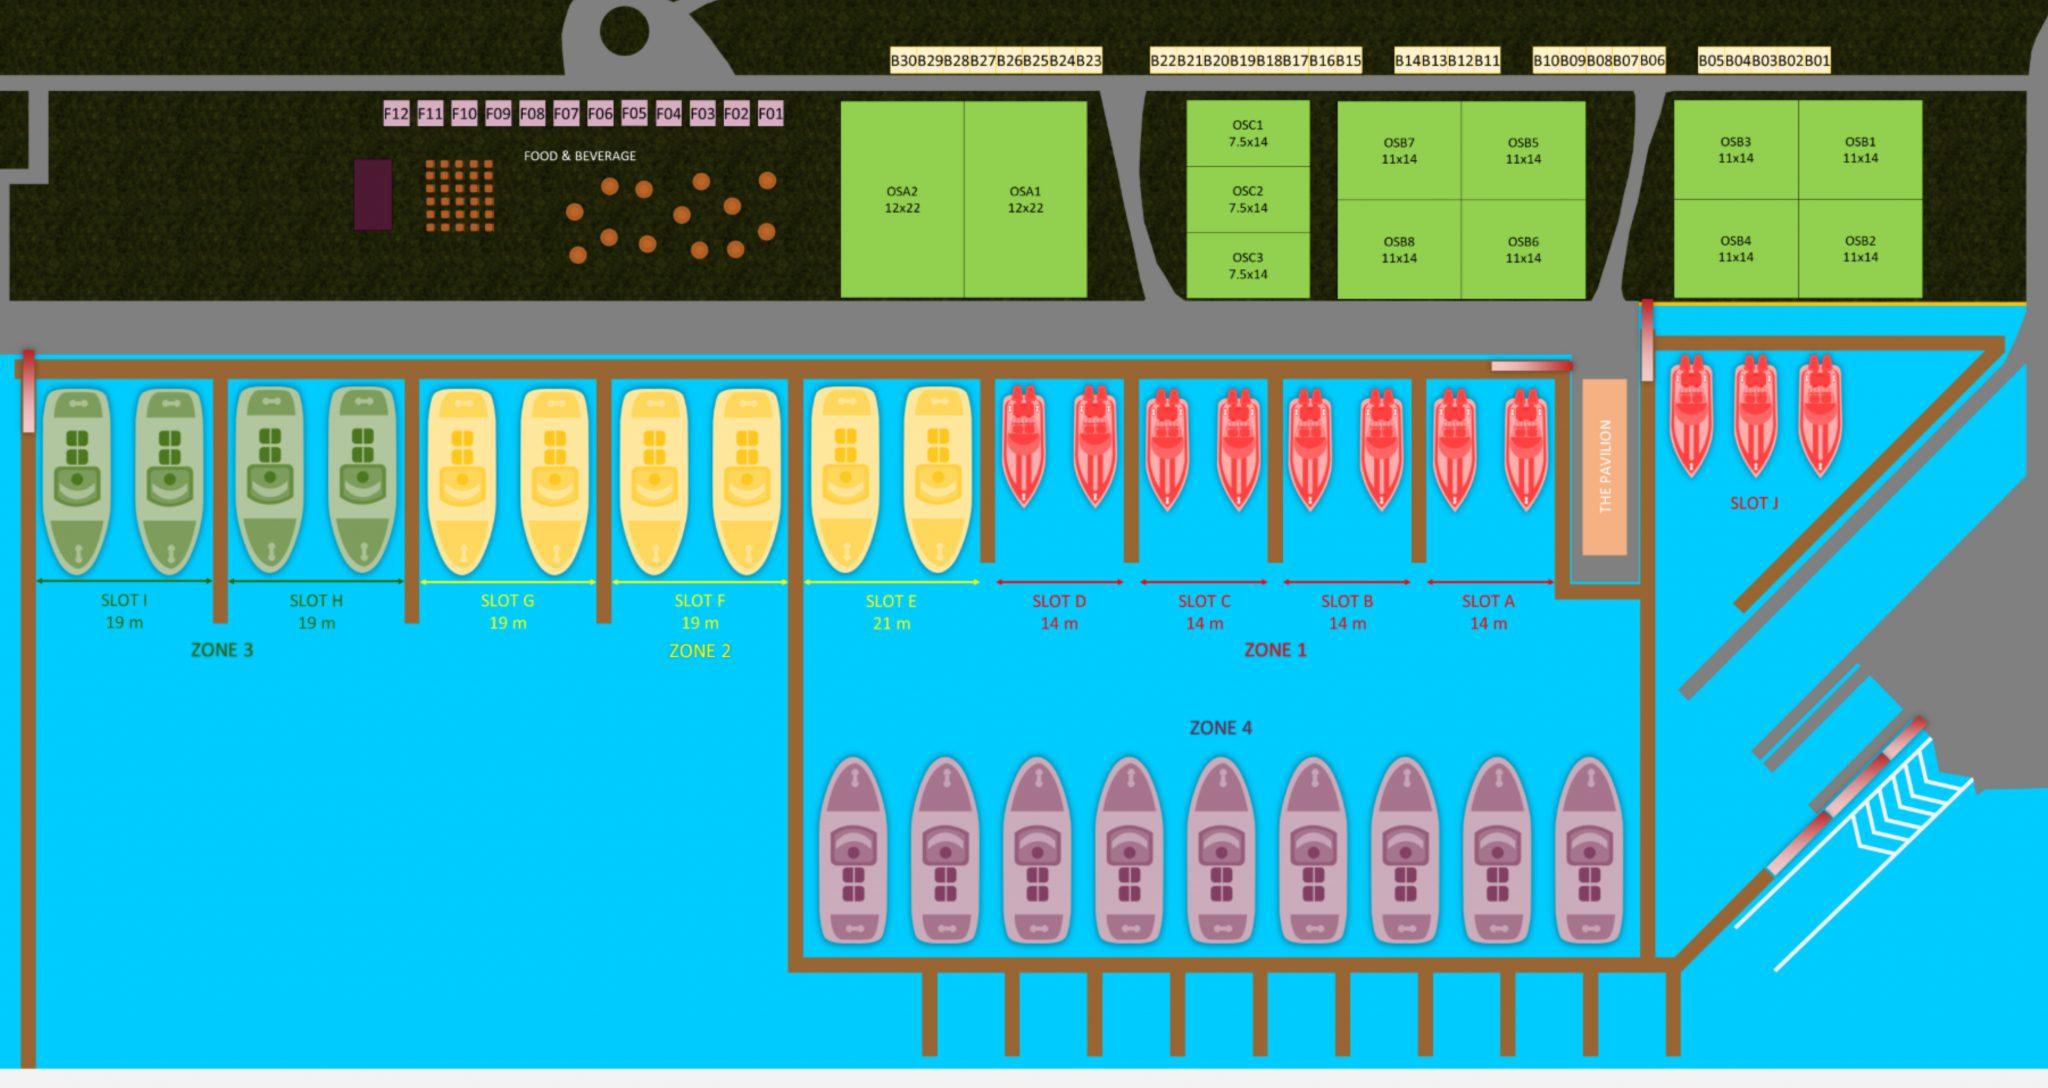 Boat Show Floor Plan 2017 (Open Air) Site Enlarge_JPG